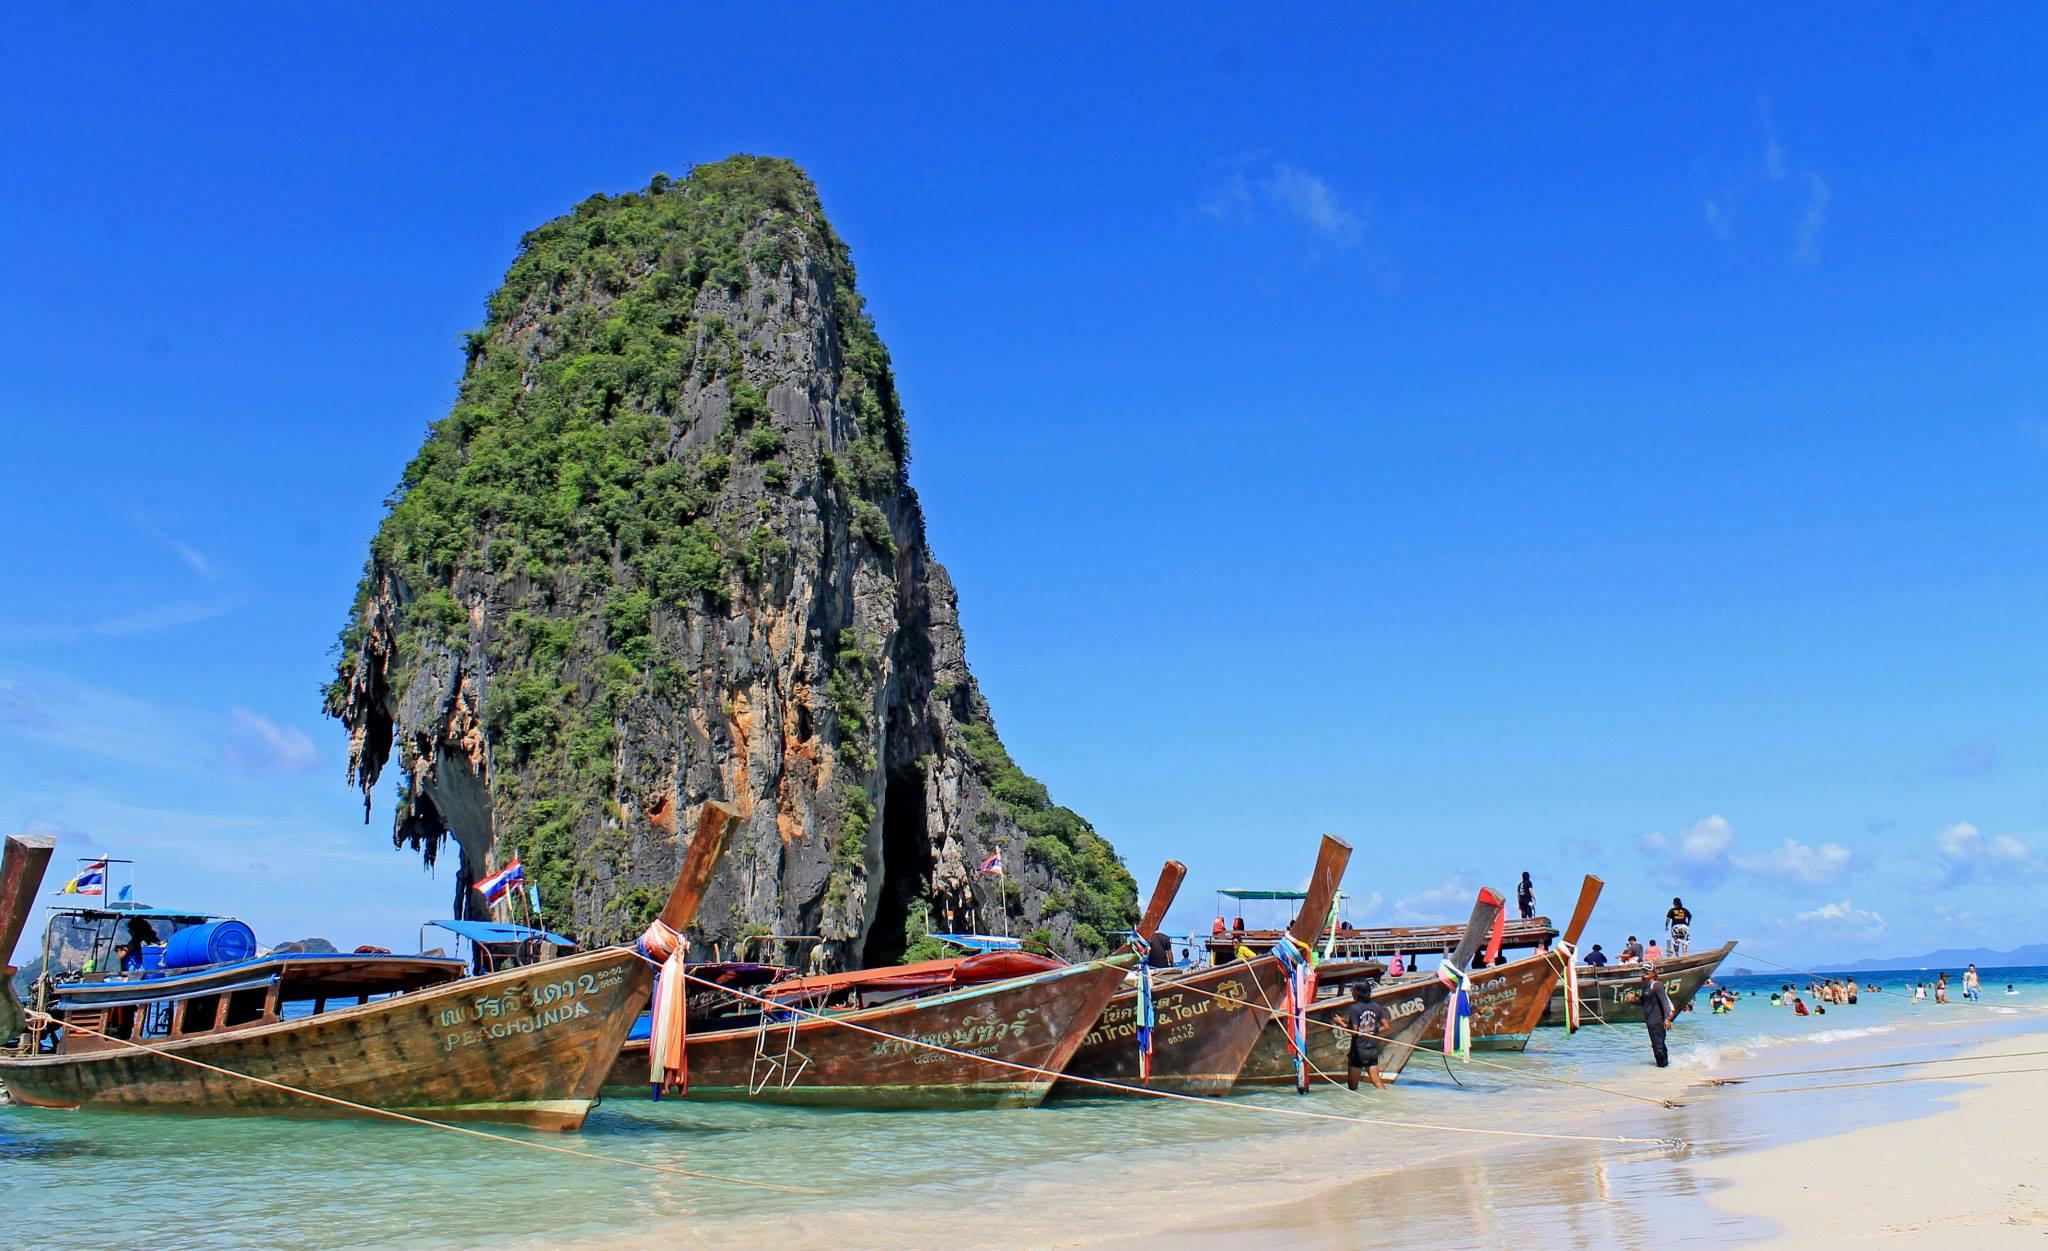 10. Tajland